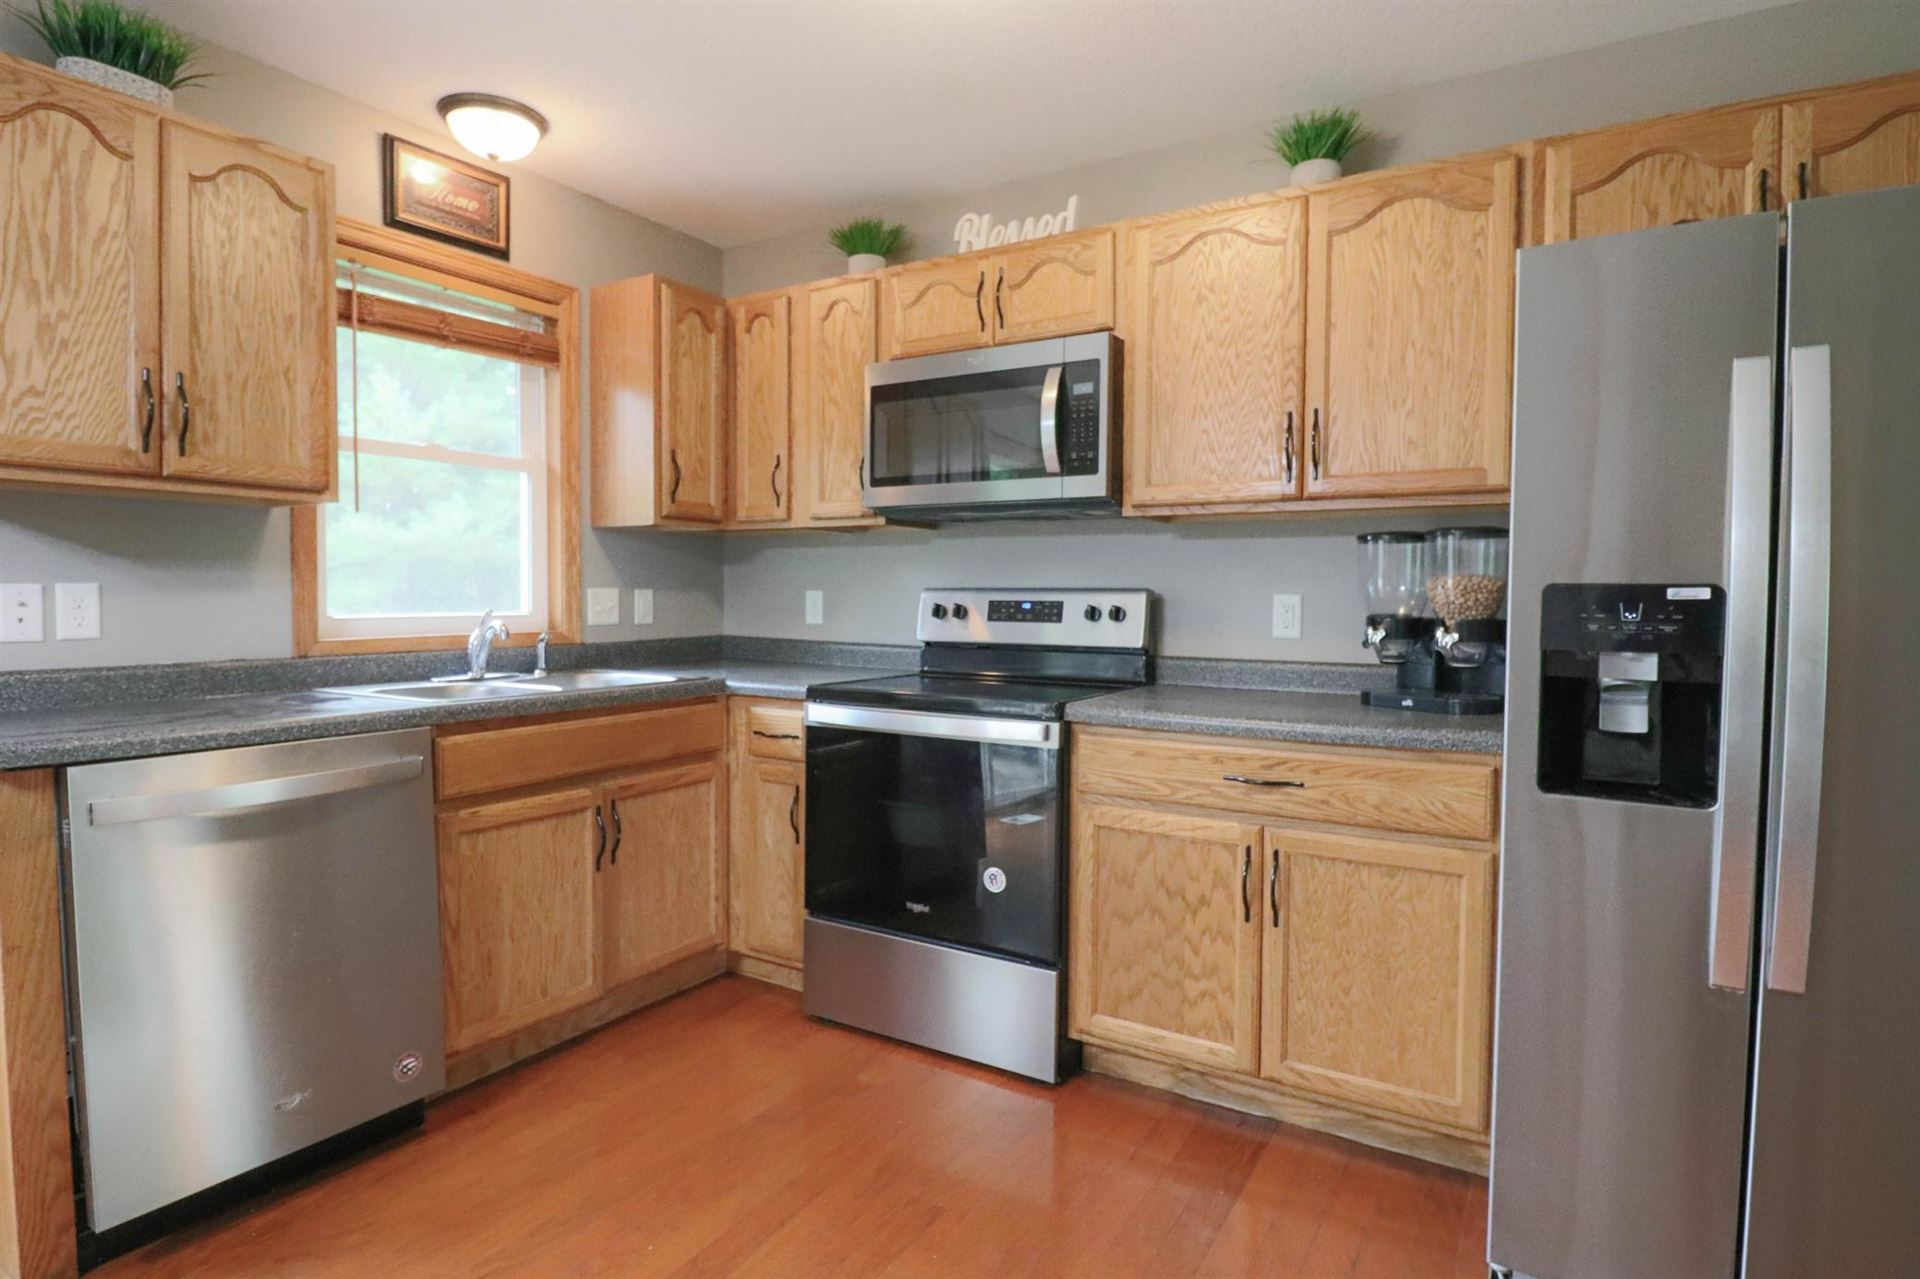 Photo of 5928 Upper 183rd Street W, Farmington, MN 55024 (MLS # 6110049)